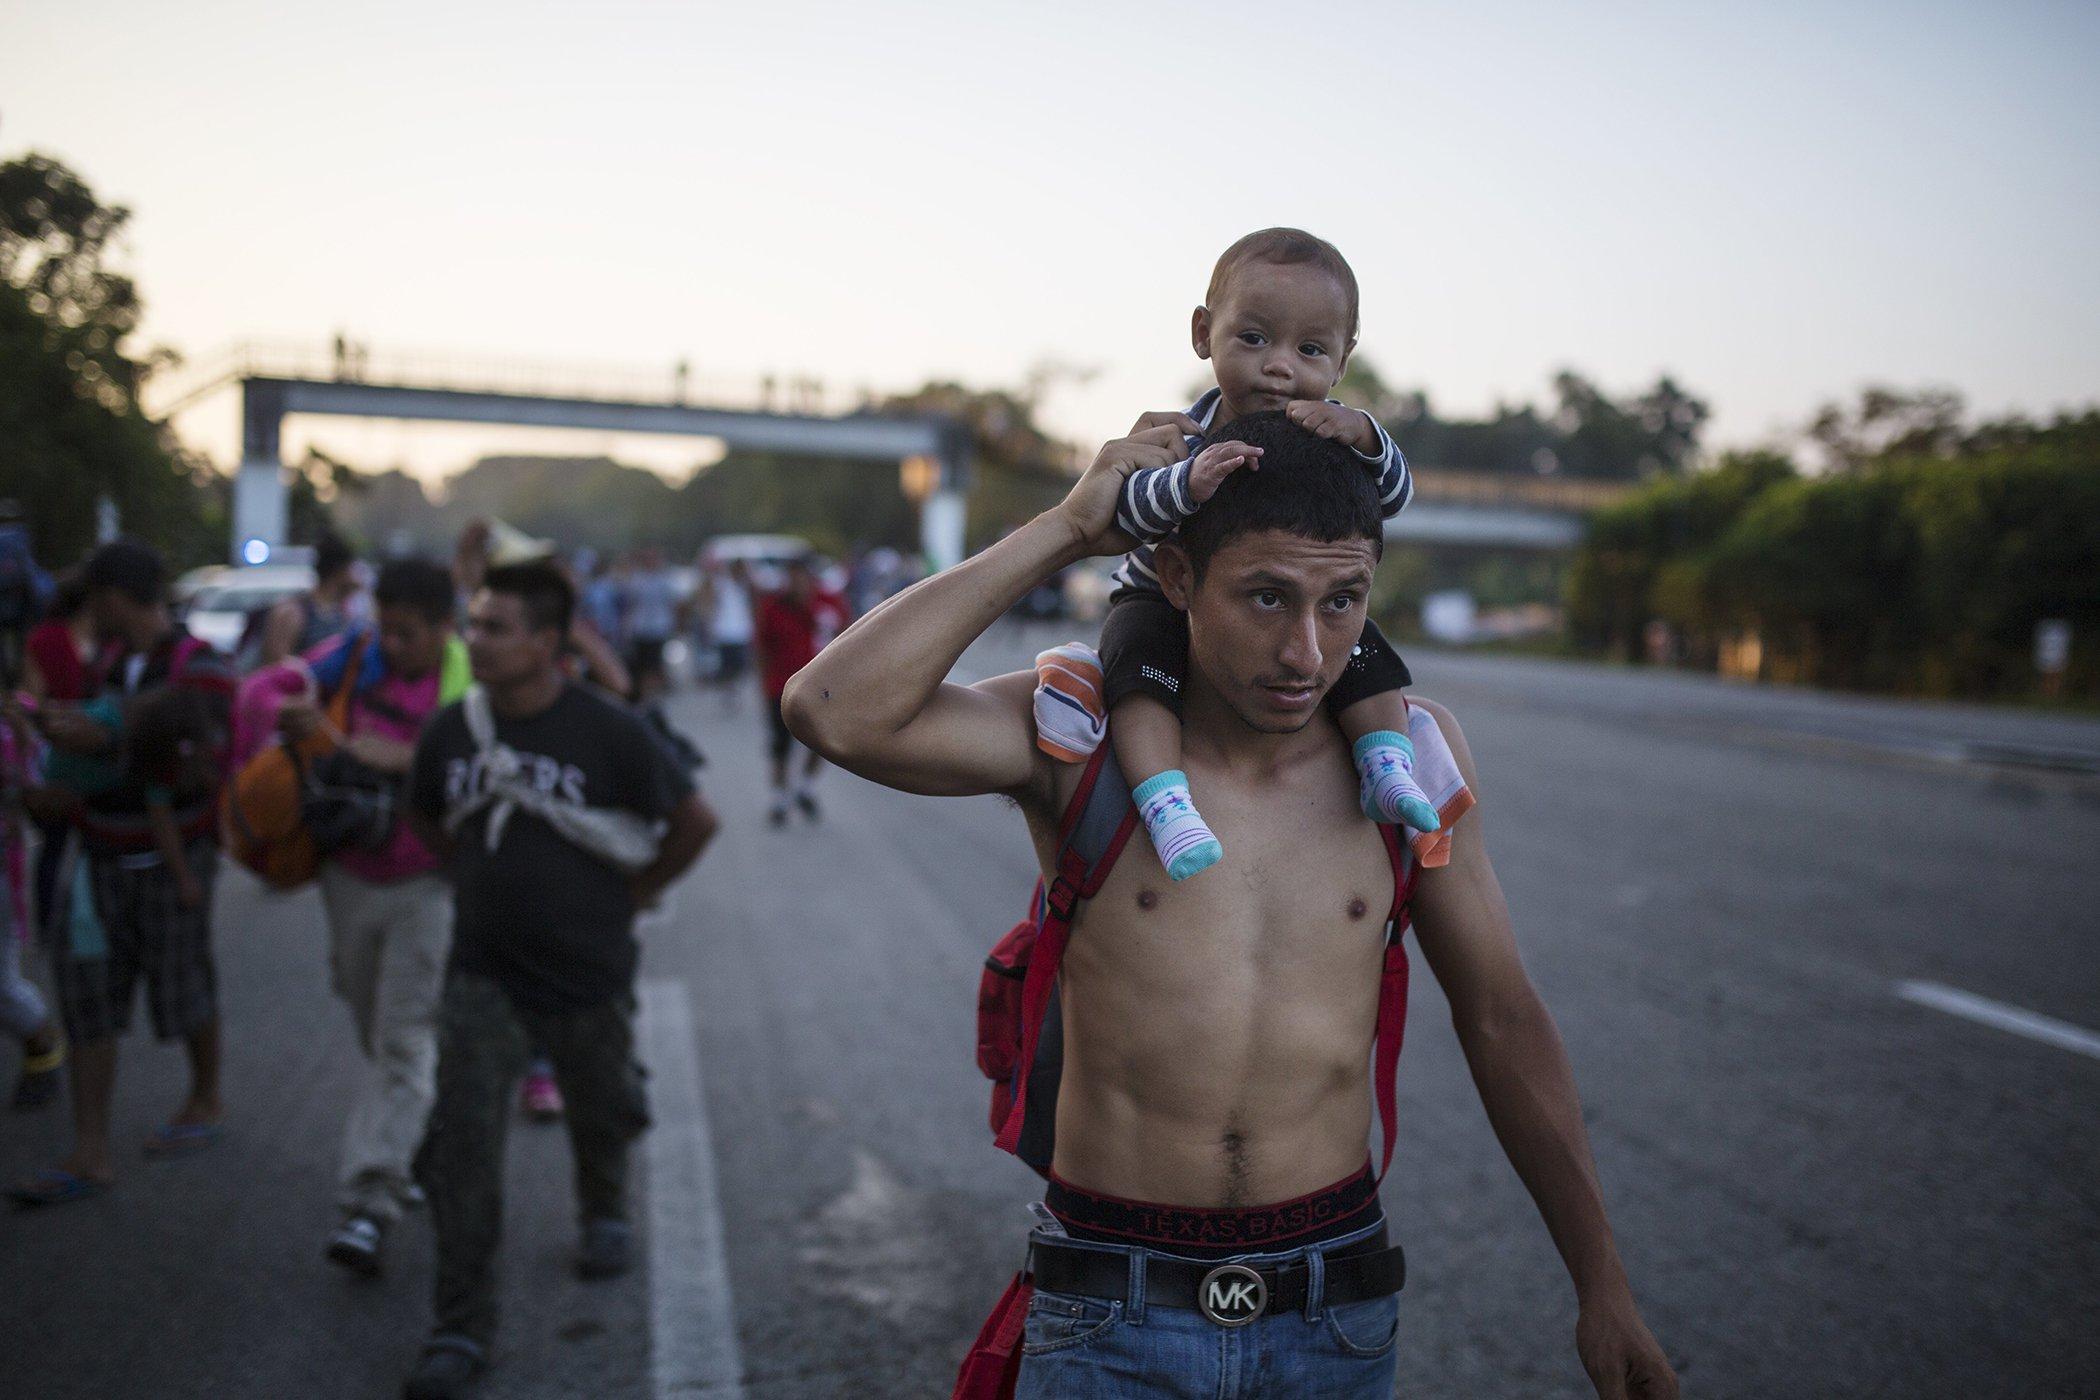 Migrant-Caravan-Hondouras-Trump-Midterm-Elections.jpg